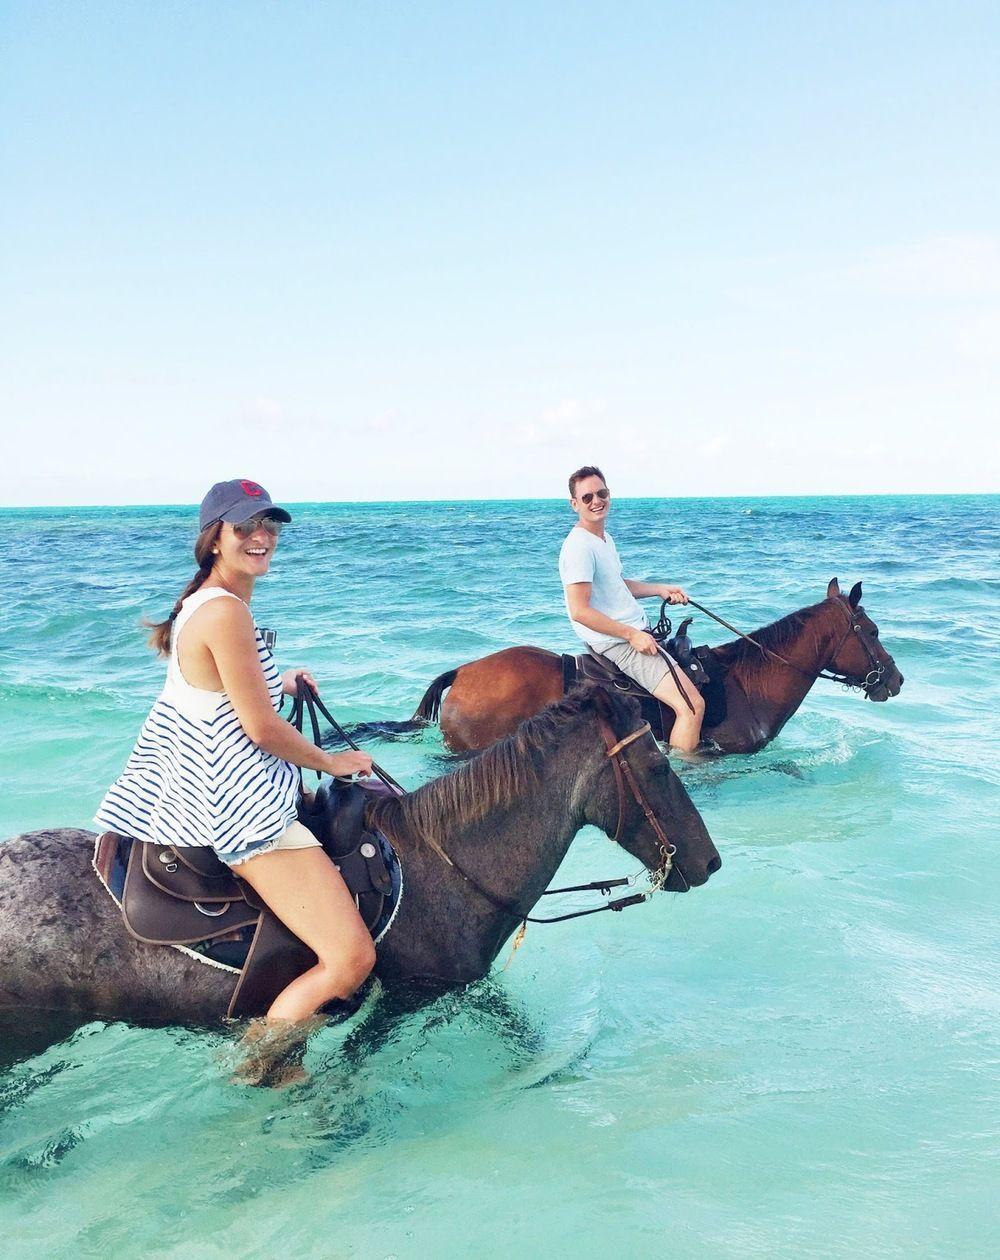 romantic beach getaways | beachs . | romantic beach getaways